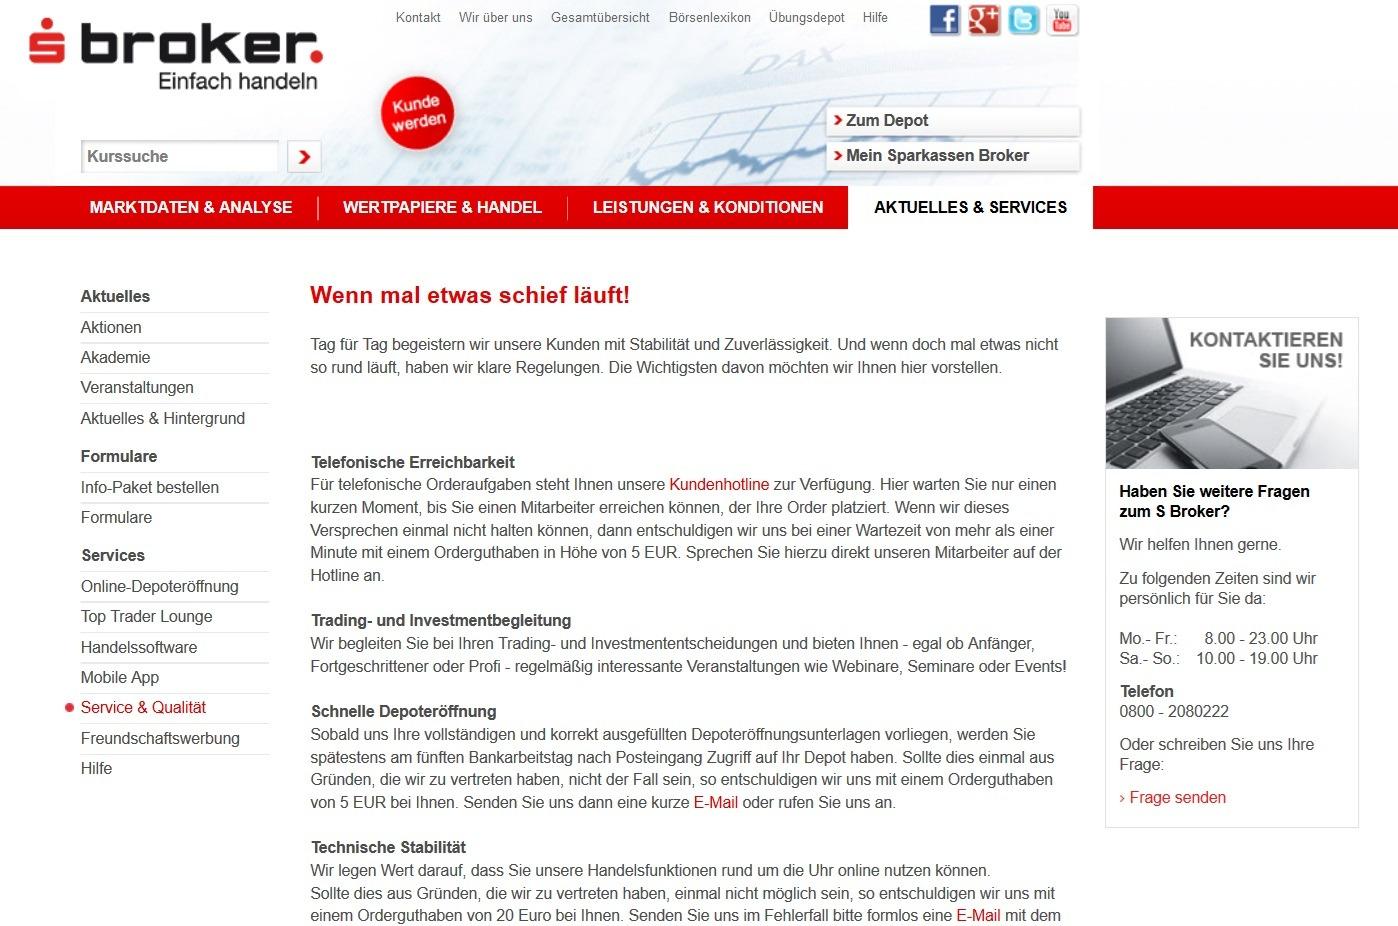 Screenshot Sparkassen Broker Servicequalität